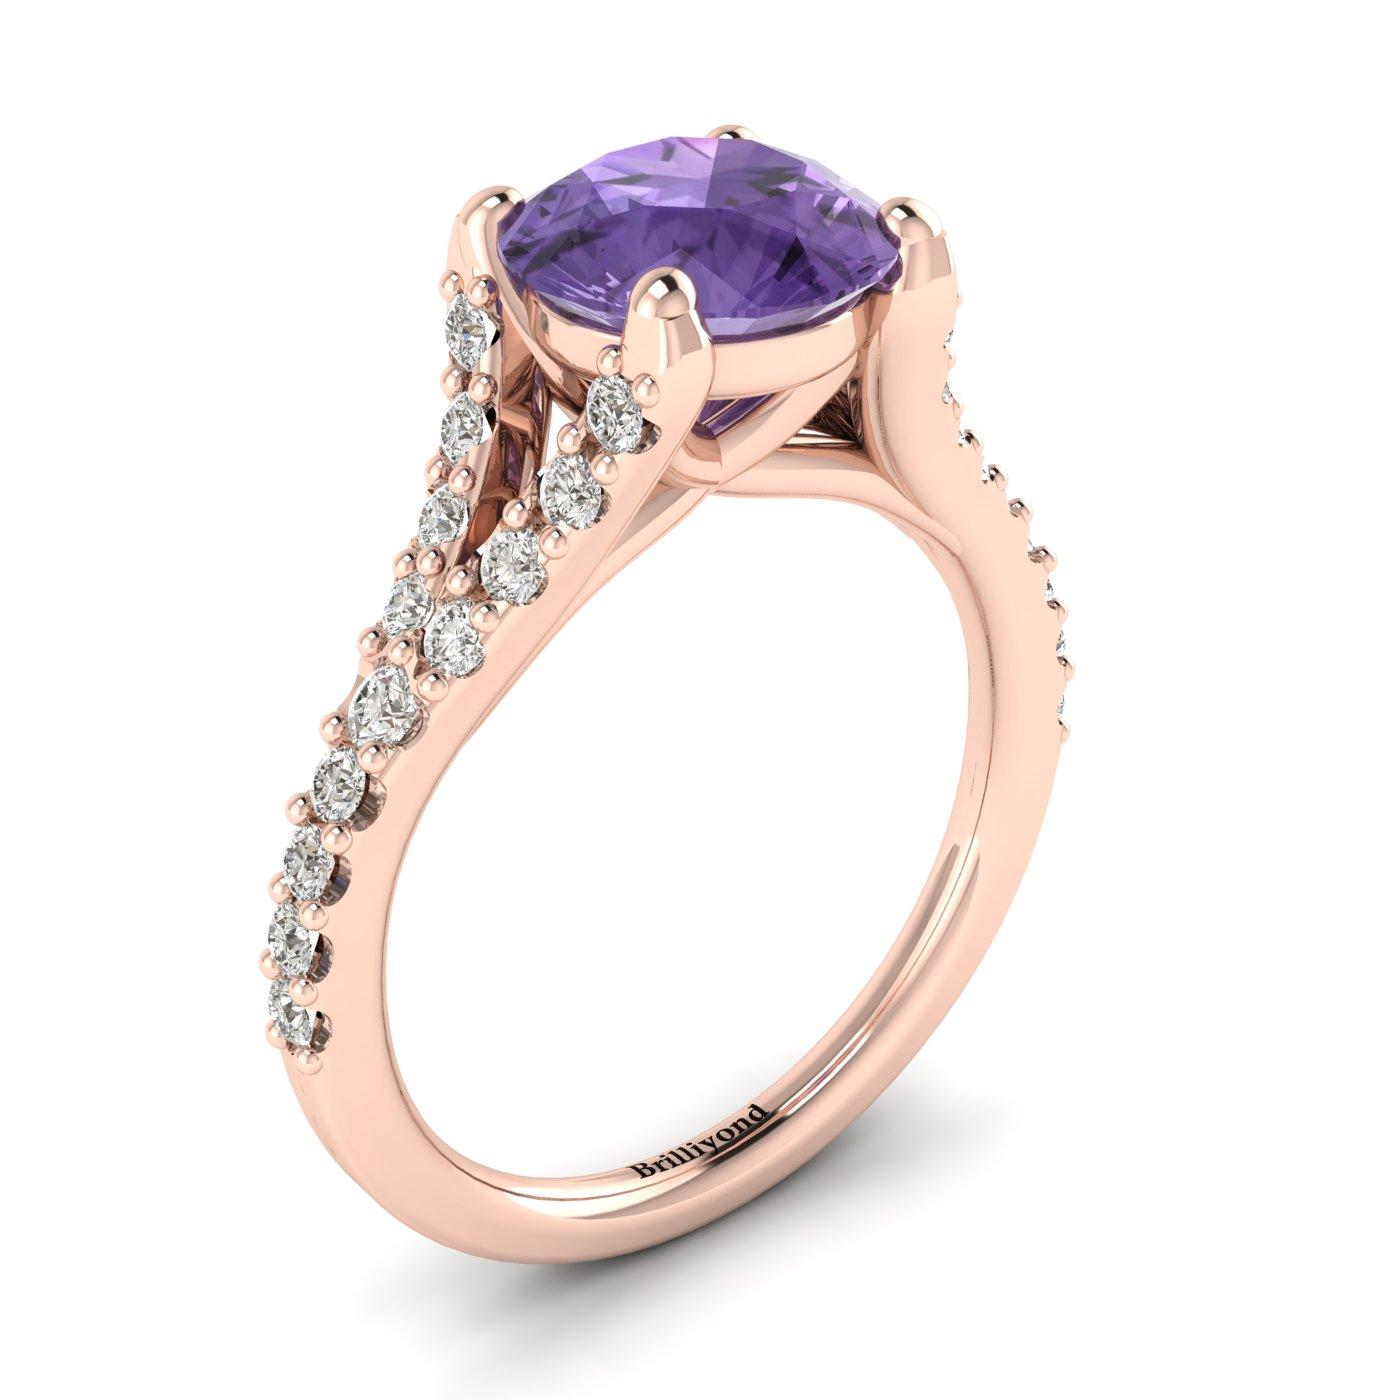 26 white created diamonds in a spectacular pavé split shank setting handset in 18k rose gold band.